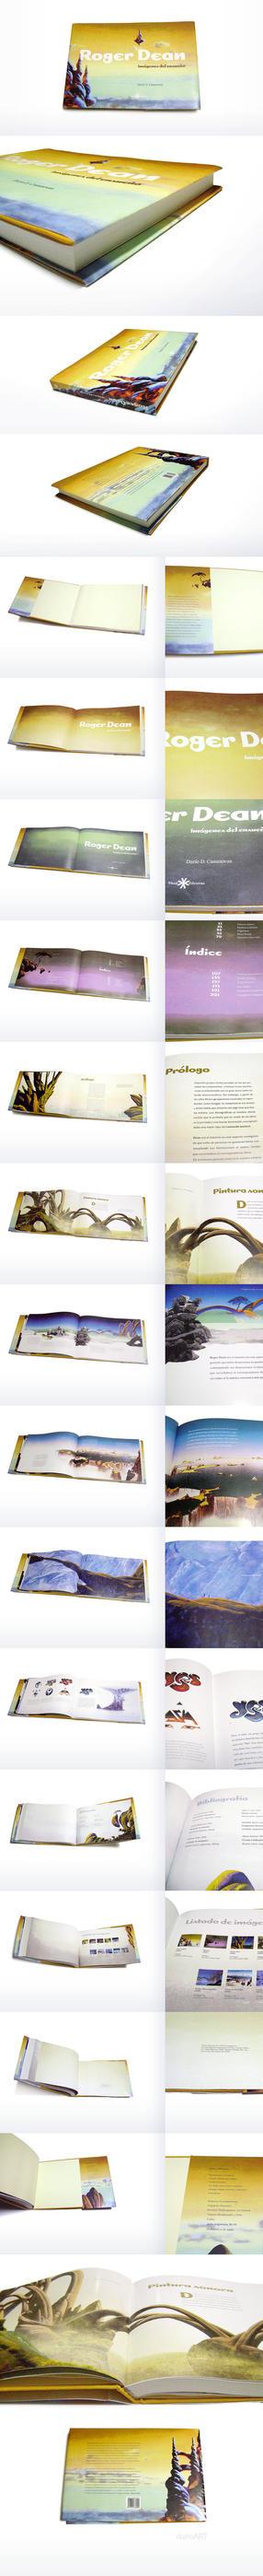 Roger Dean's book by darioart